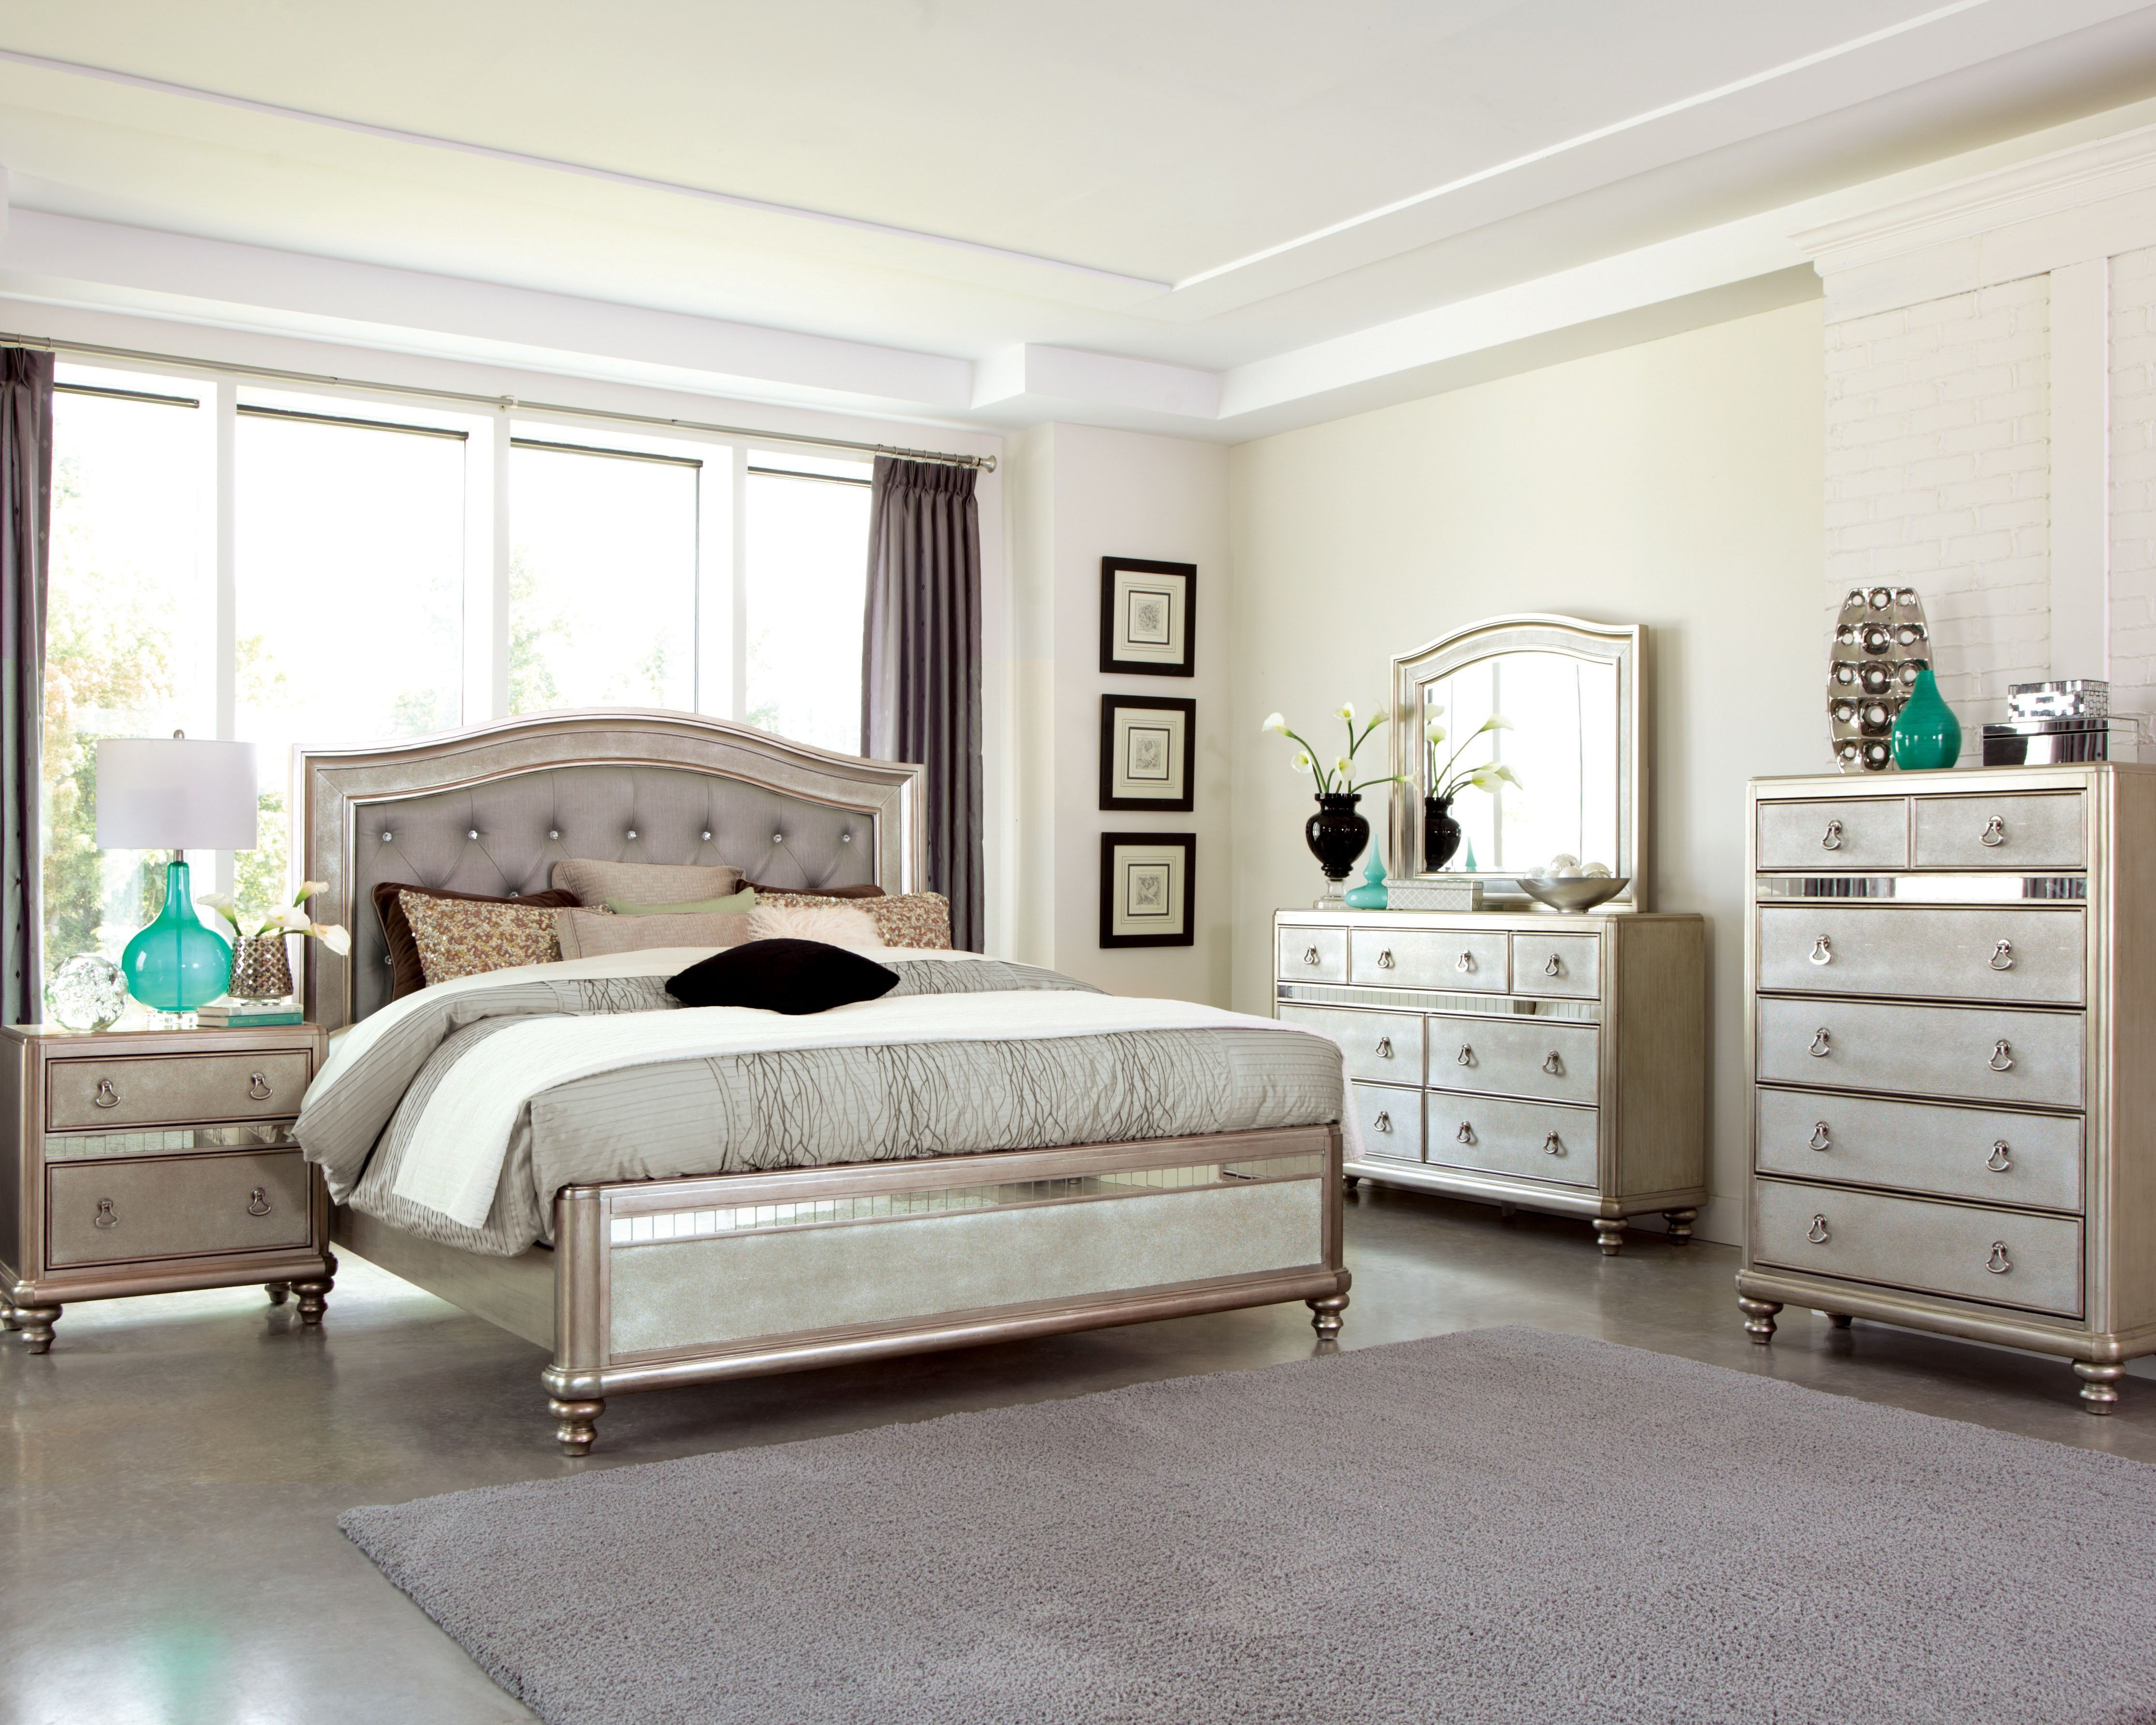 metallic finish bedroom furniture - Glam Bedroom Furniture